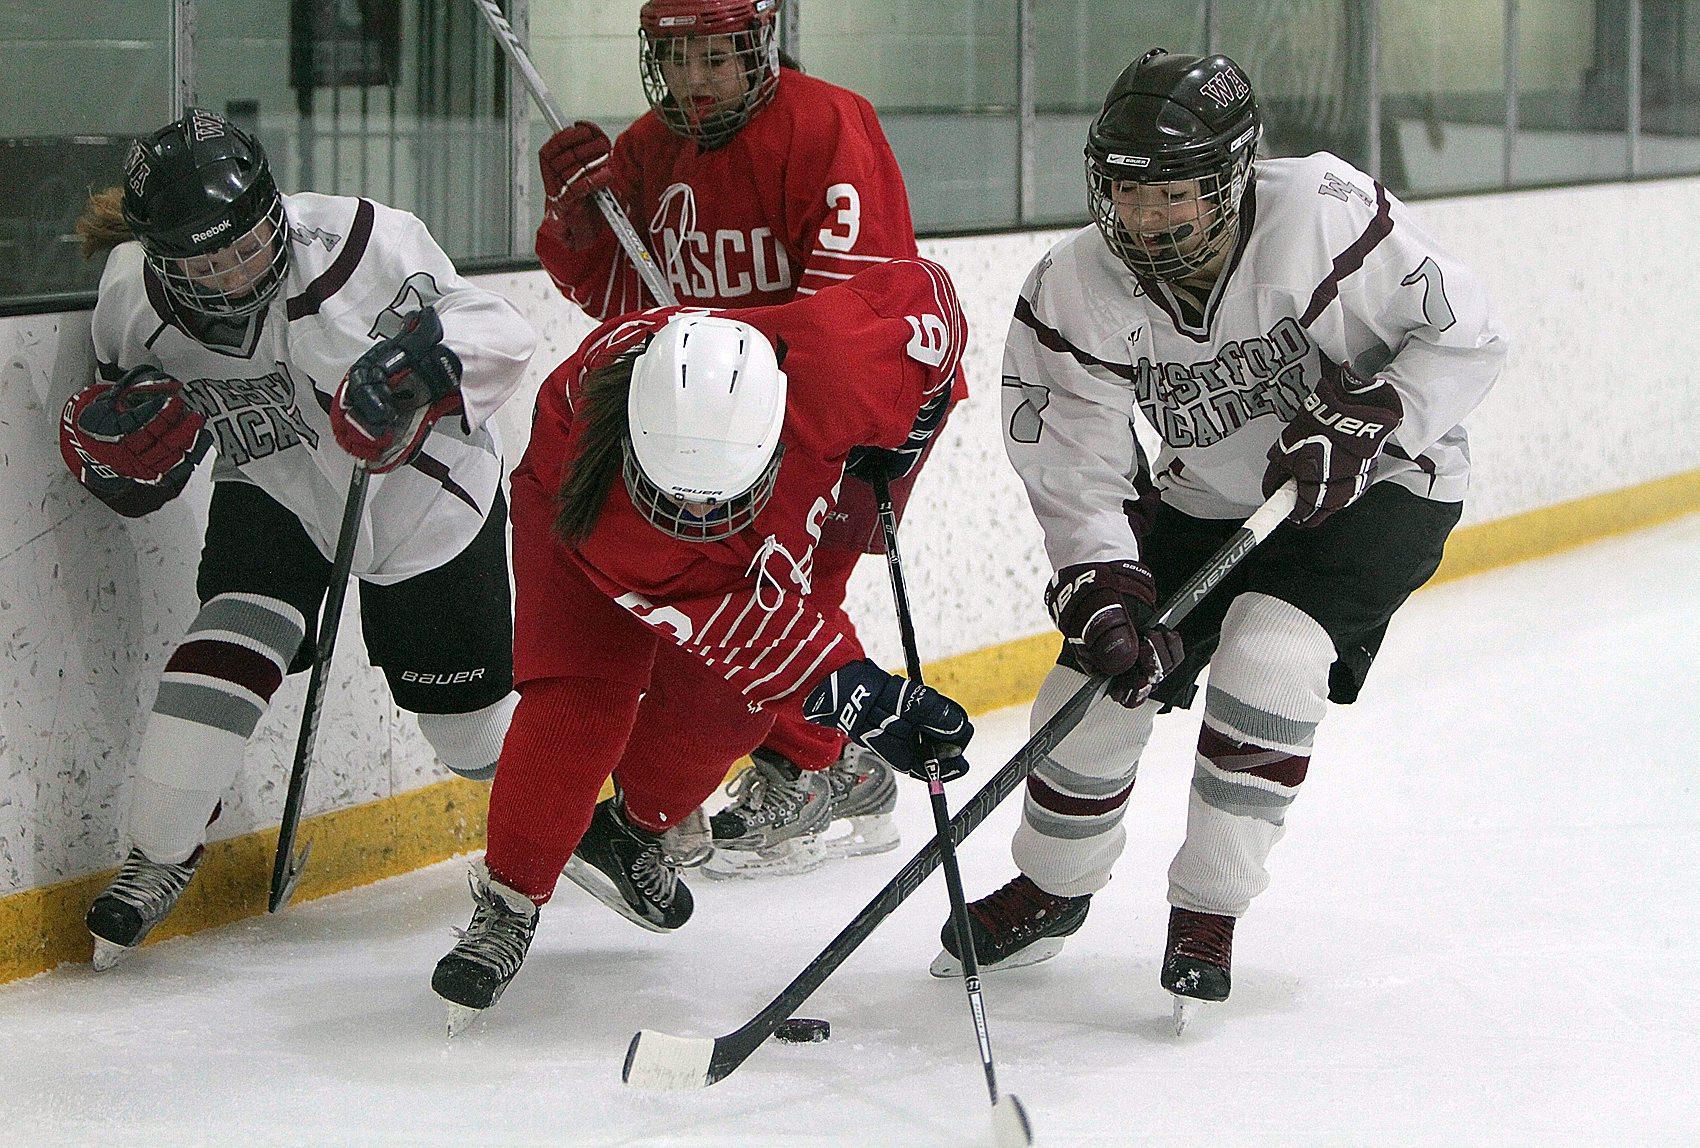 Alayna Serpa -(#7) captain of the 15-16 WA girl's hockey team